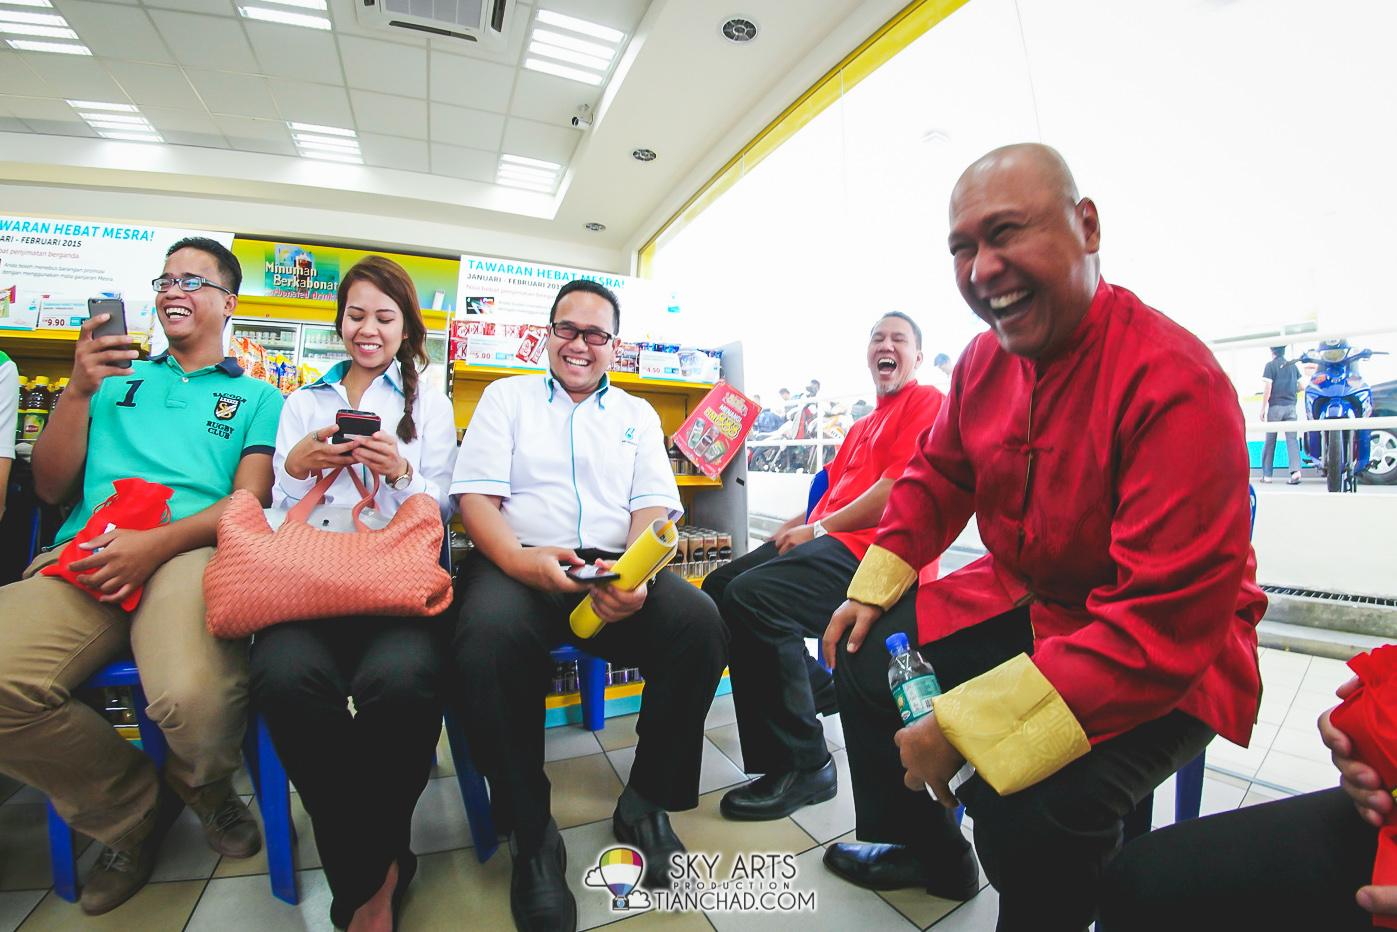 We had a fun interview session with Encik Shaharuddin M. Sidek and Encik Mohd Ibrahimnuddin Mohd Yunus